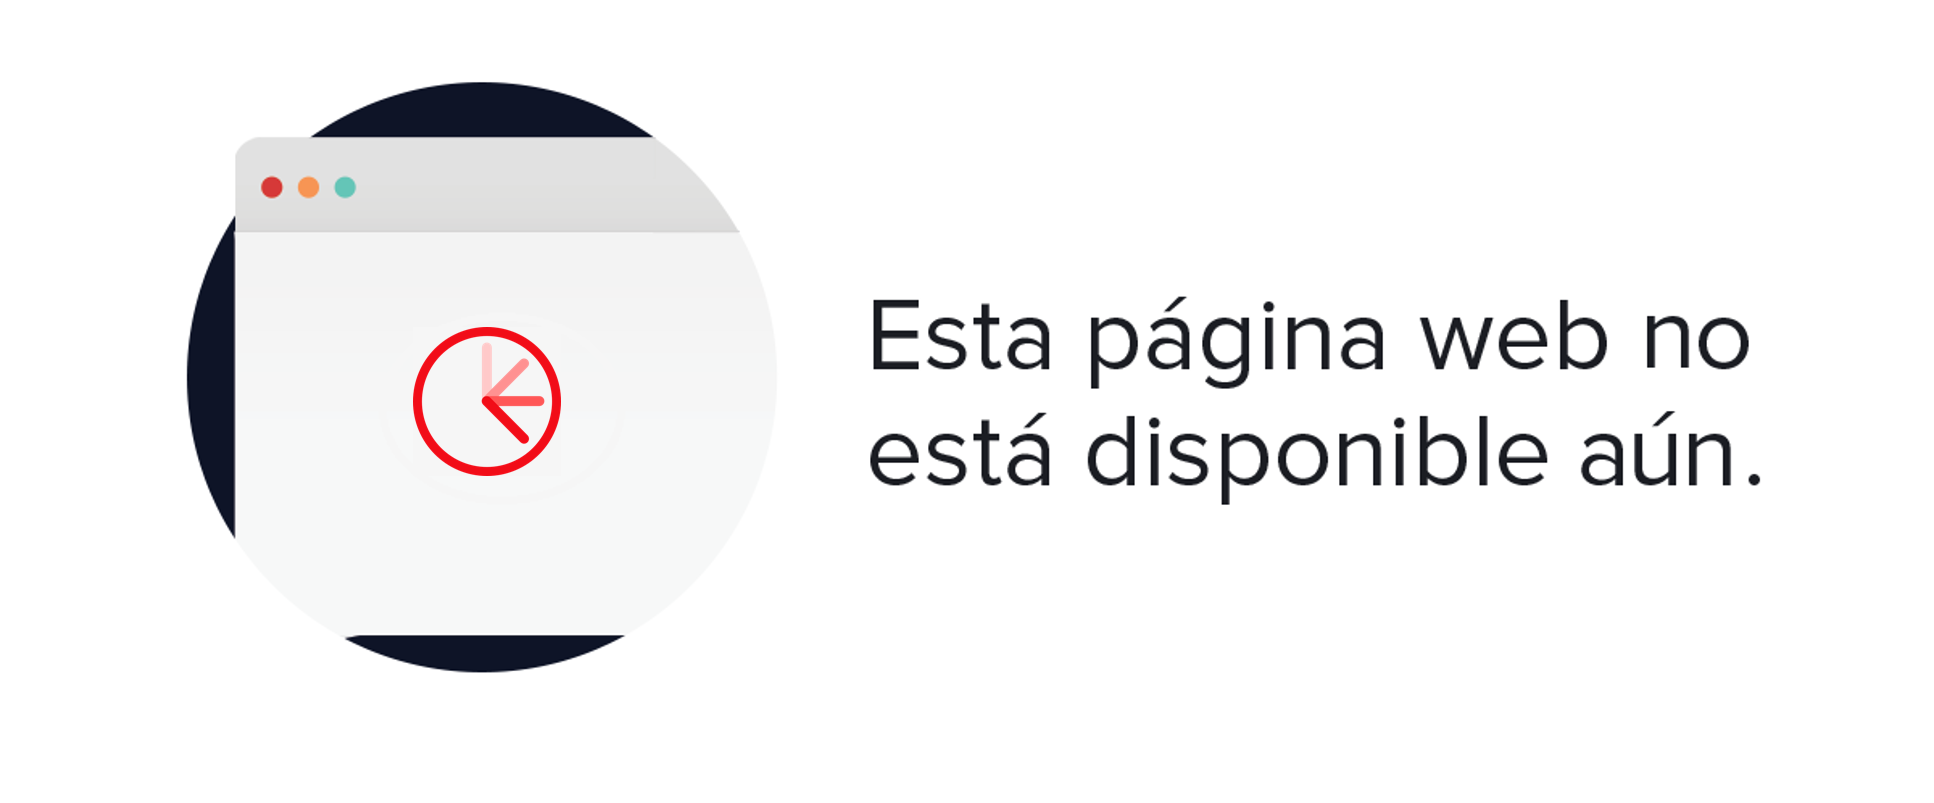 Easy Wear - Pantalón ancho de mujer Easy Wear negro Negro 001041565401019001 - OGYBQPA